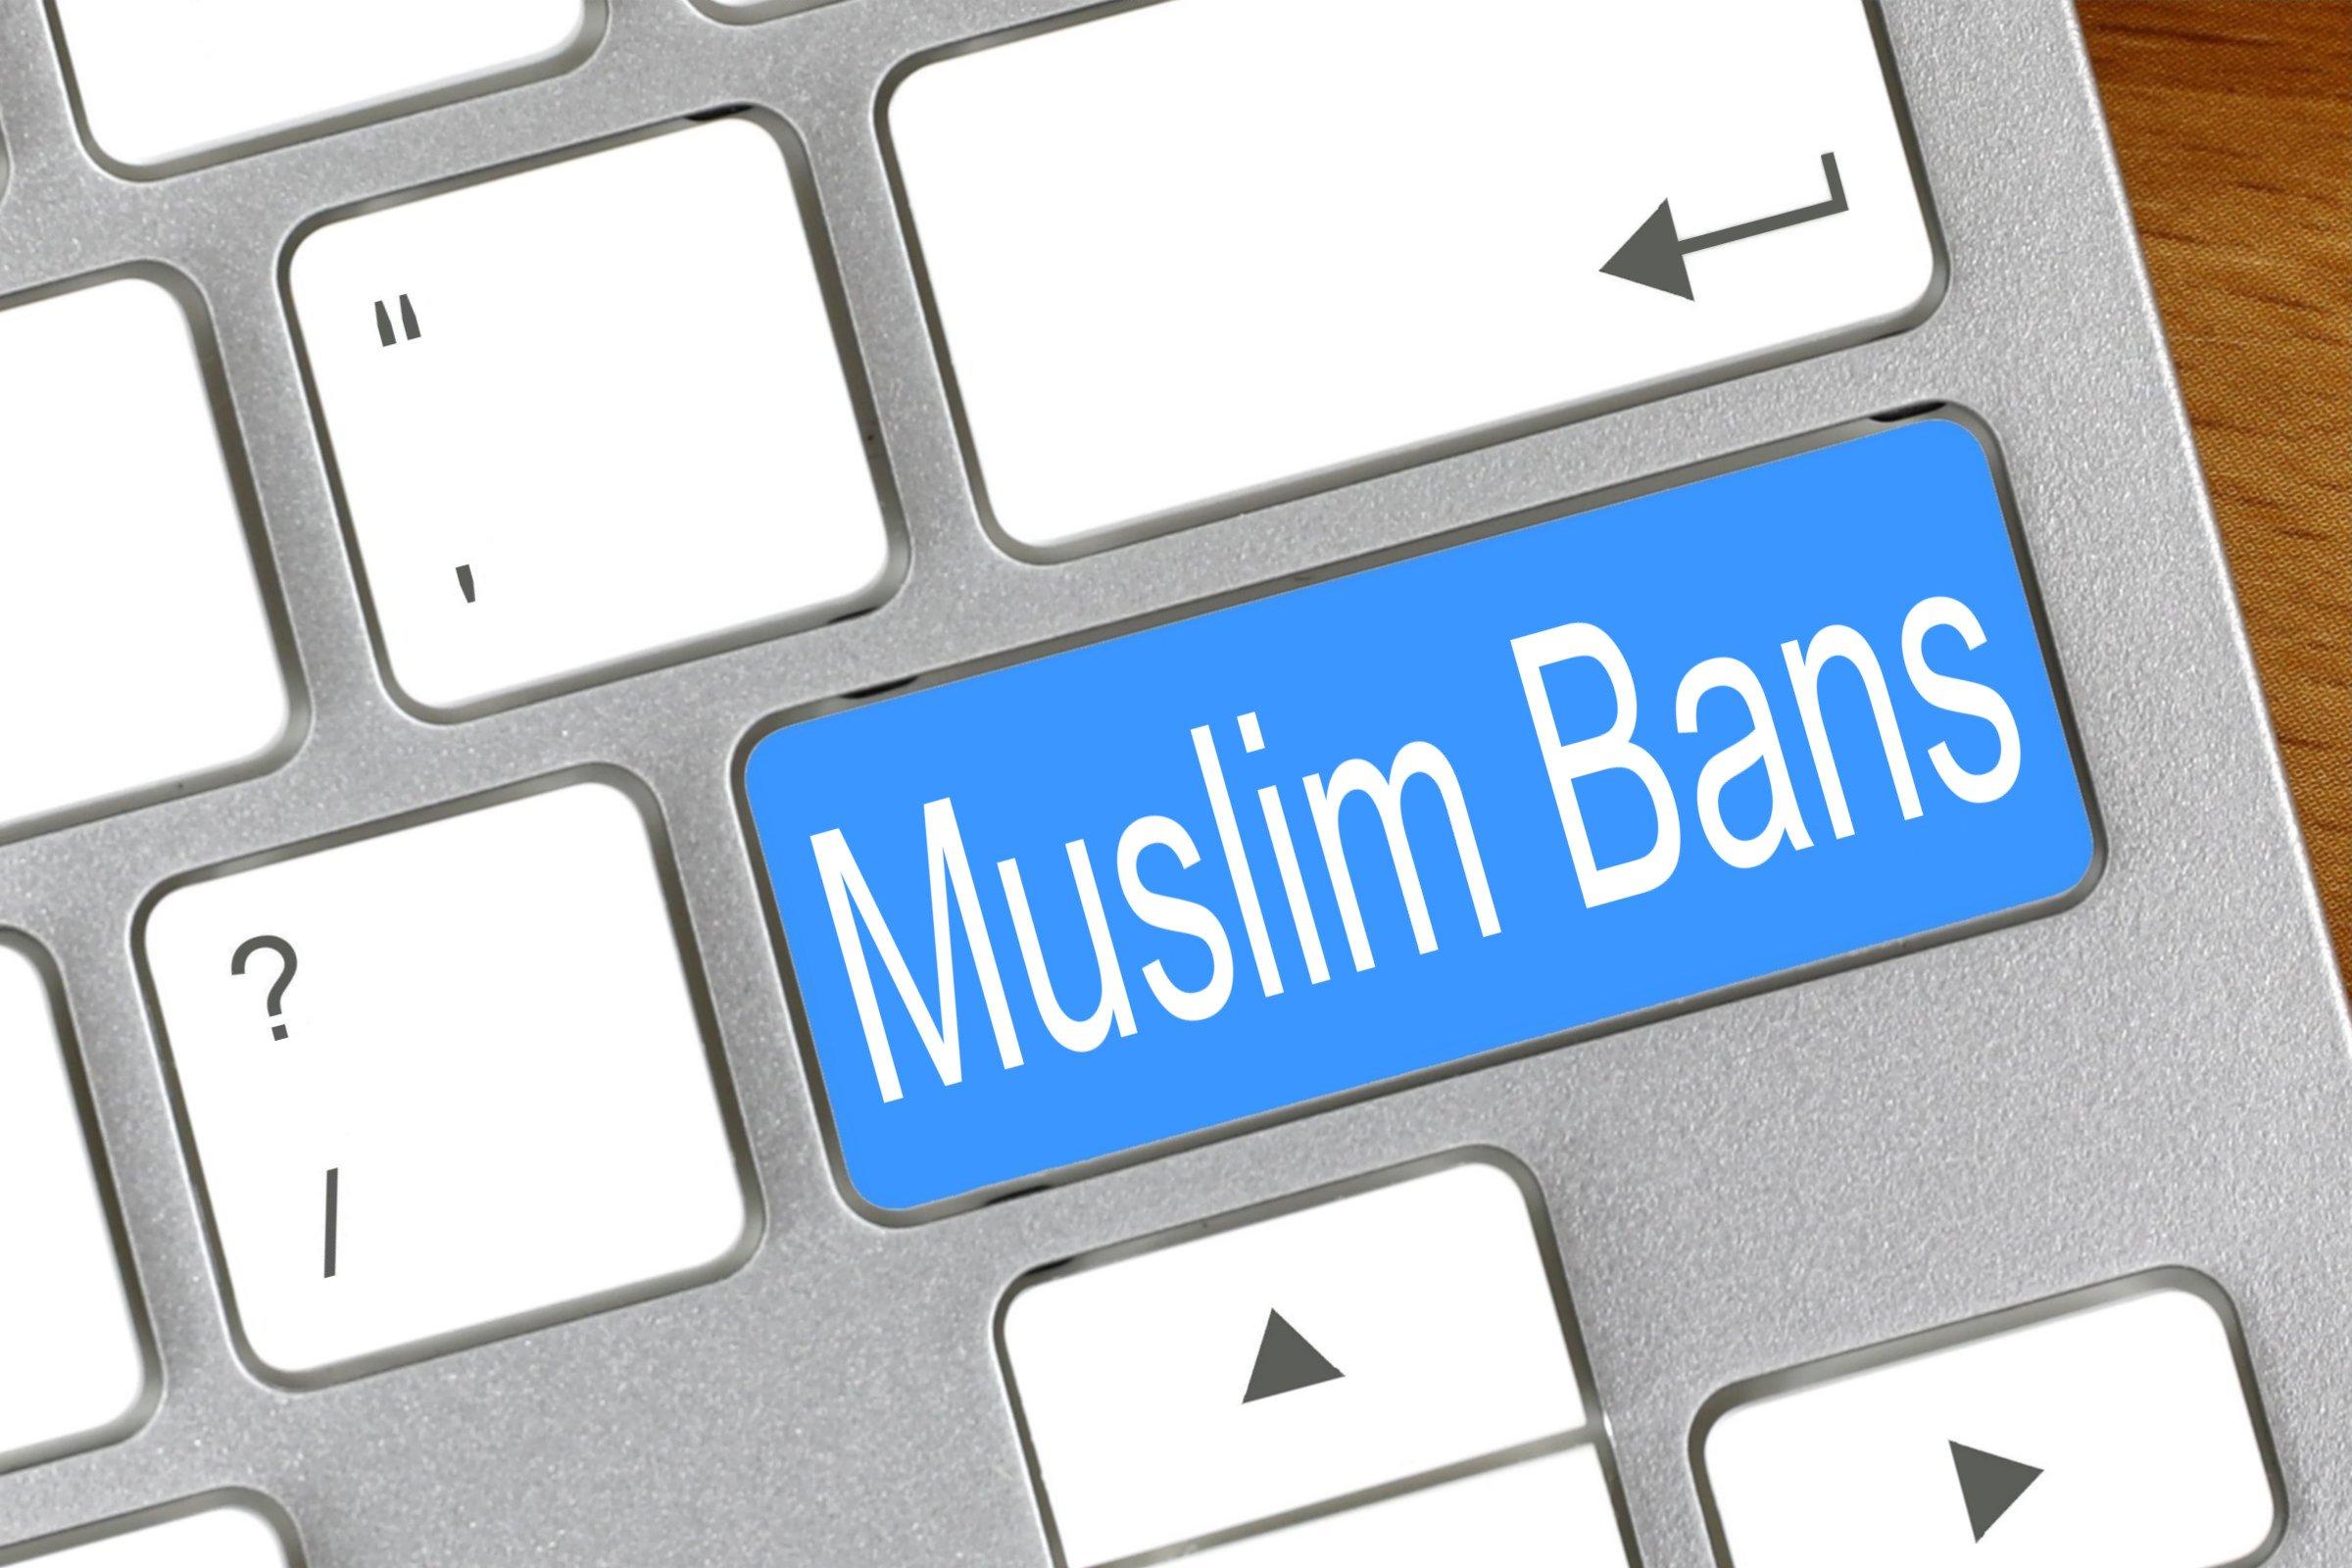 Muslim Bans